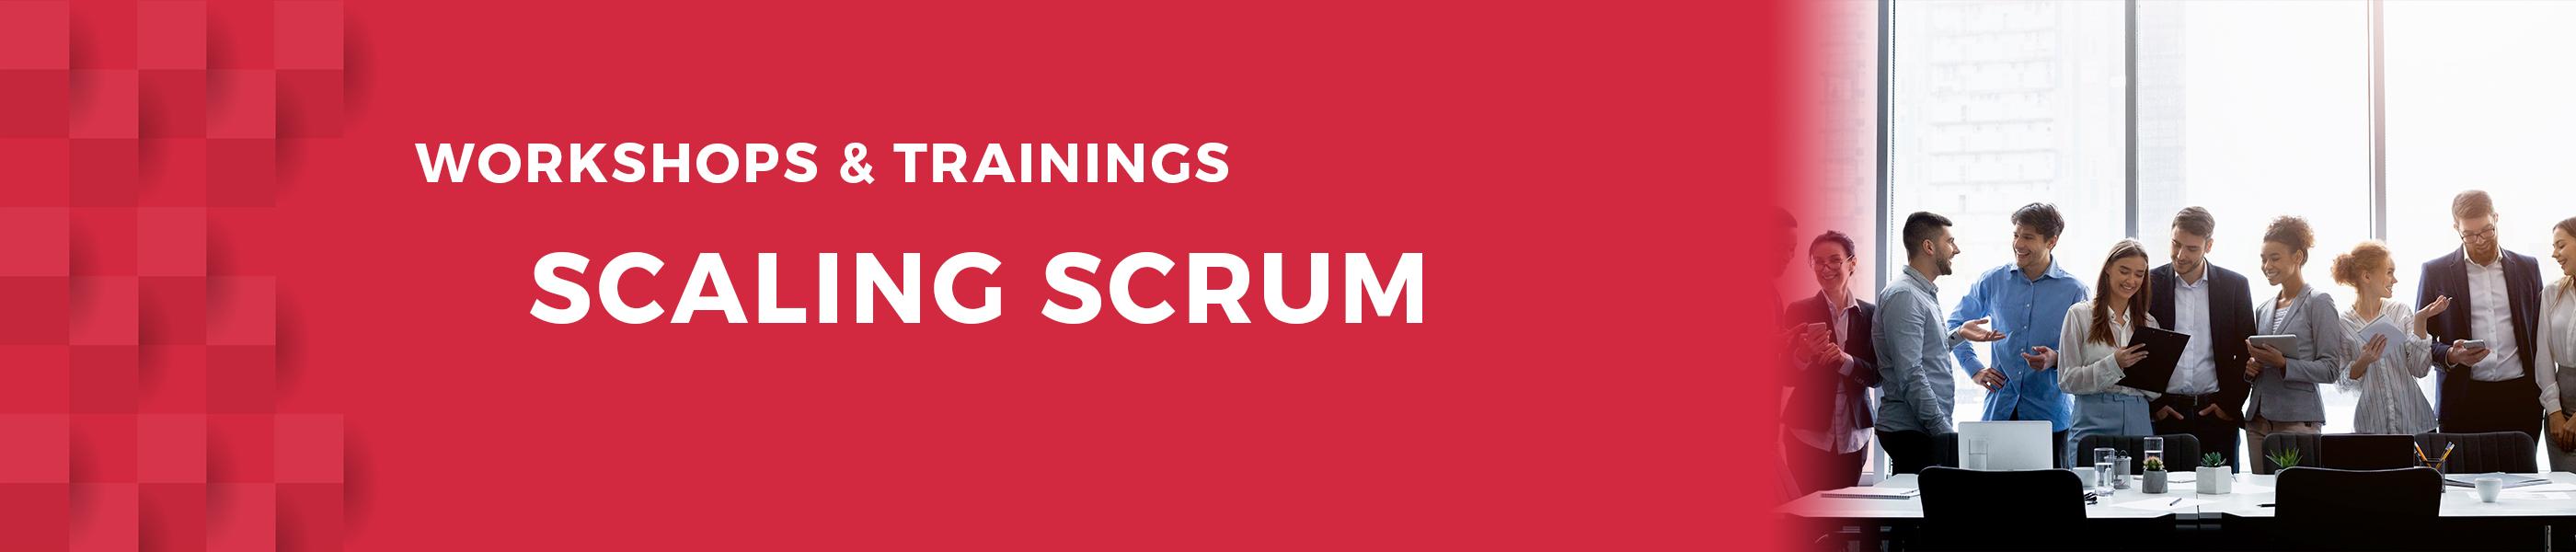 Scaling-Scrum-banner